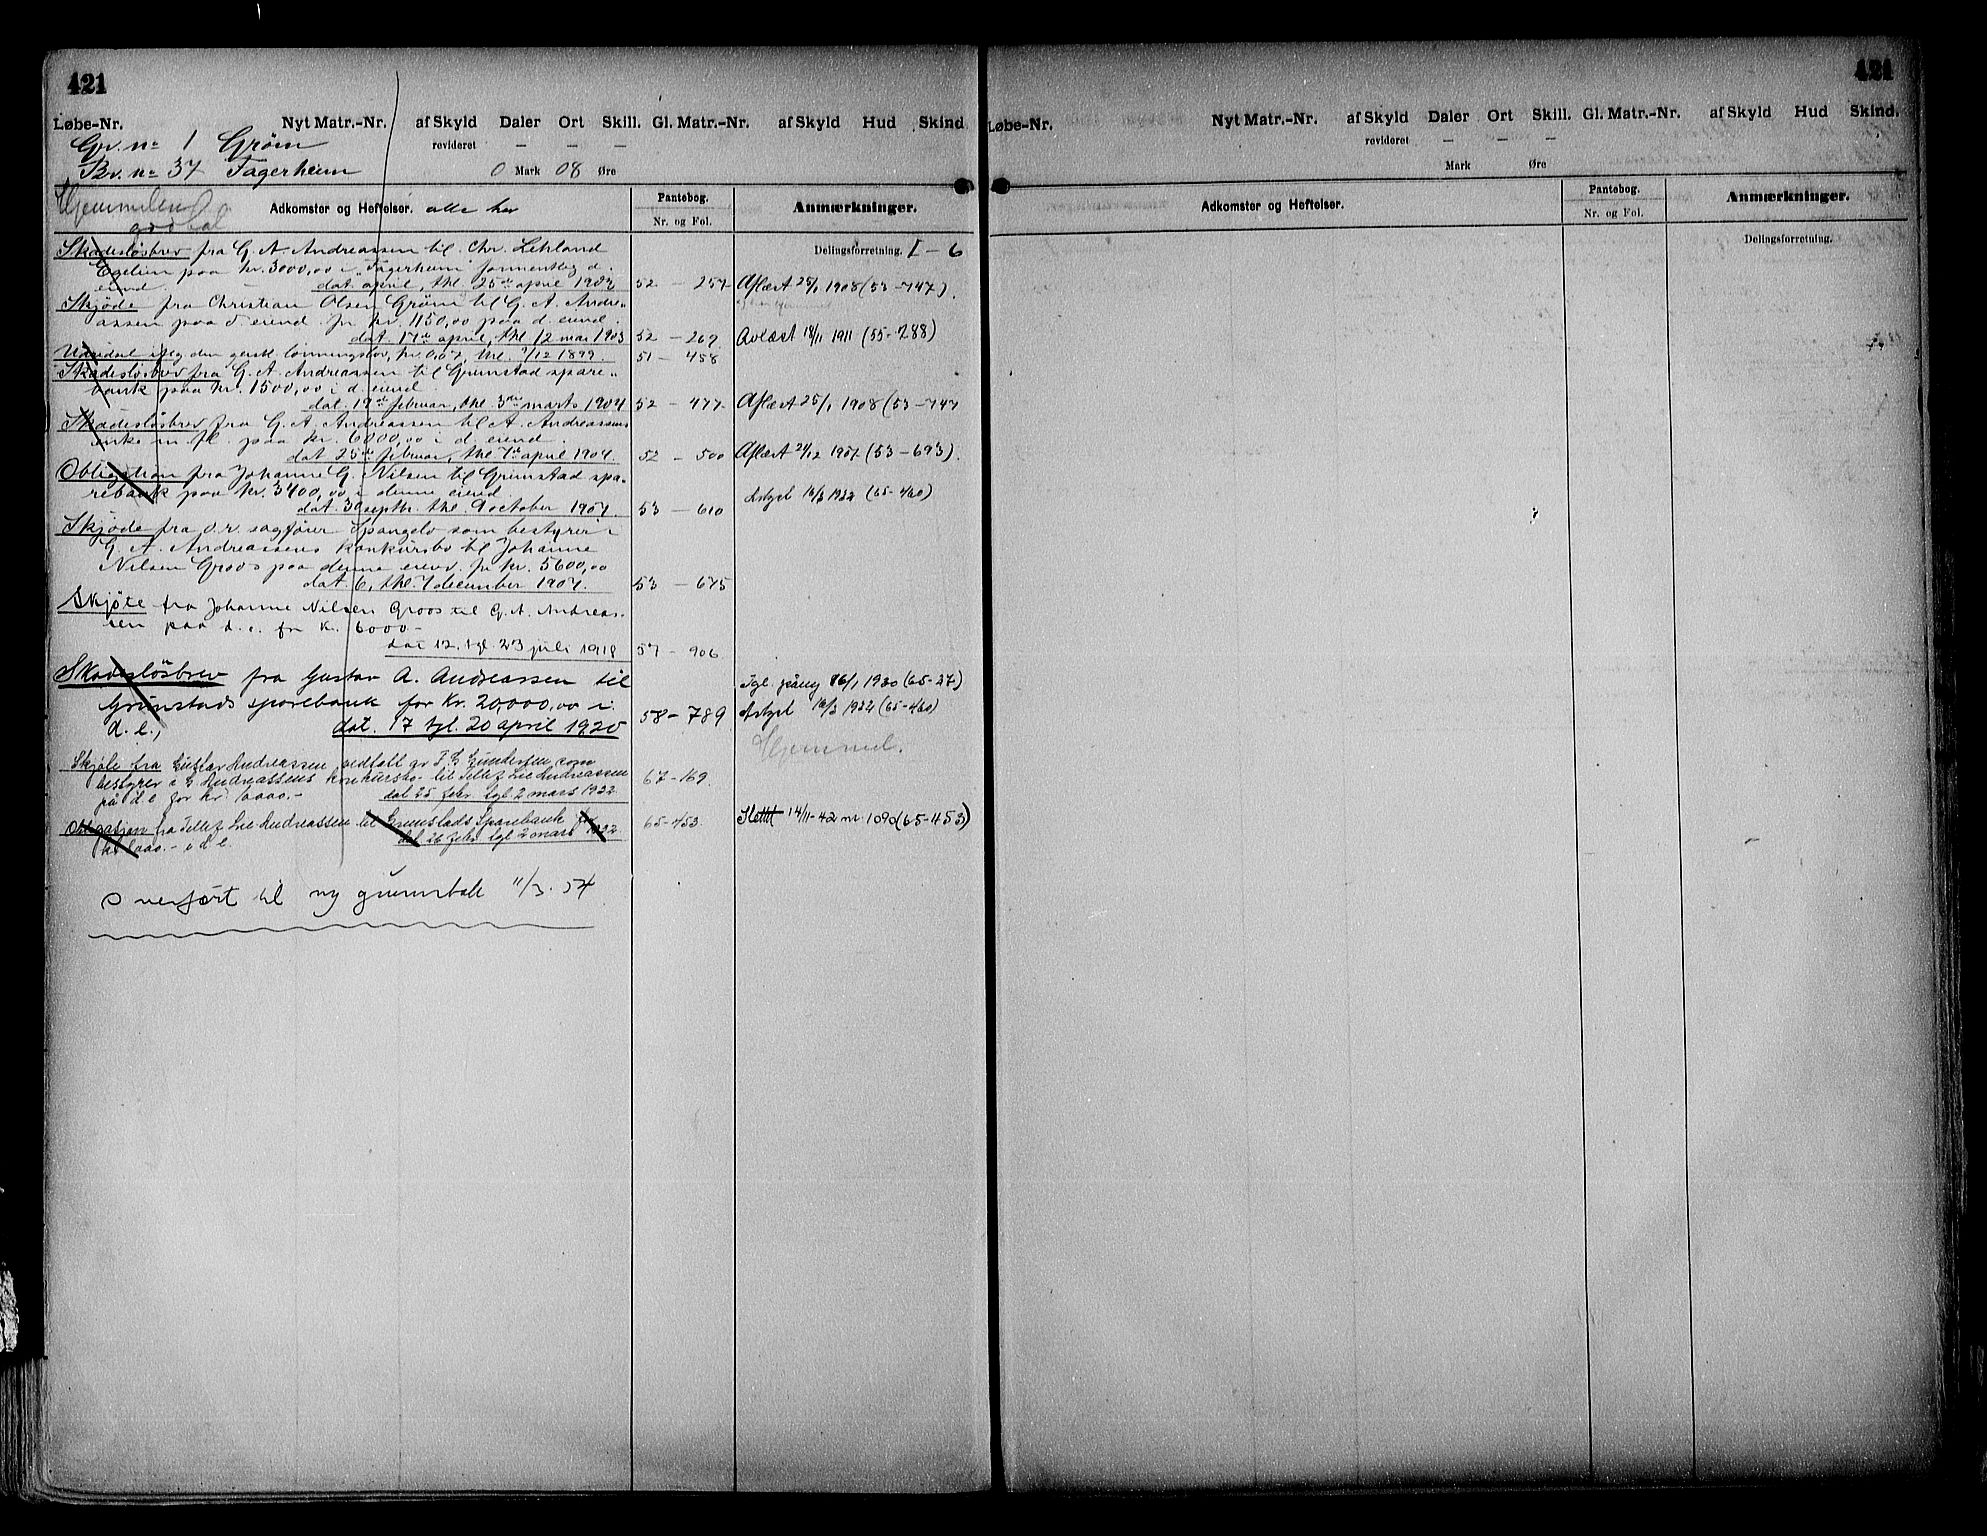 SAK, Vestre Nedenes/Sand sorenskriveri, G/Ga/L0018: Panteregister nr. 13b, 1872-1956, s. 421